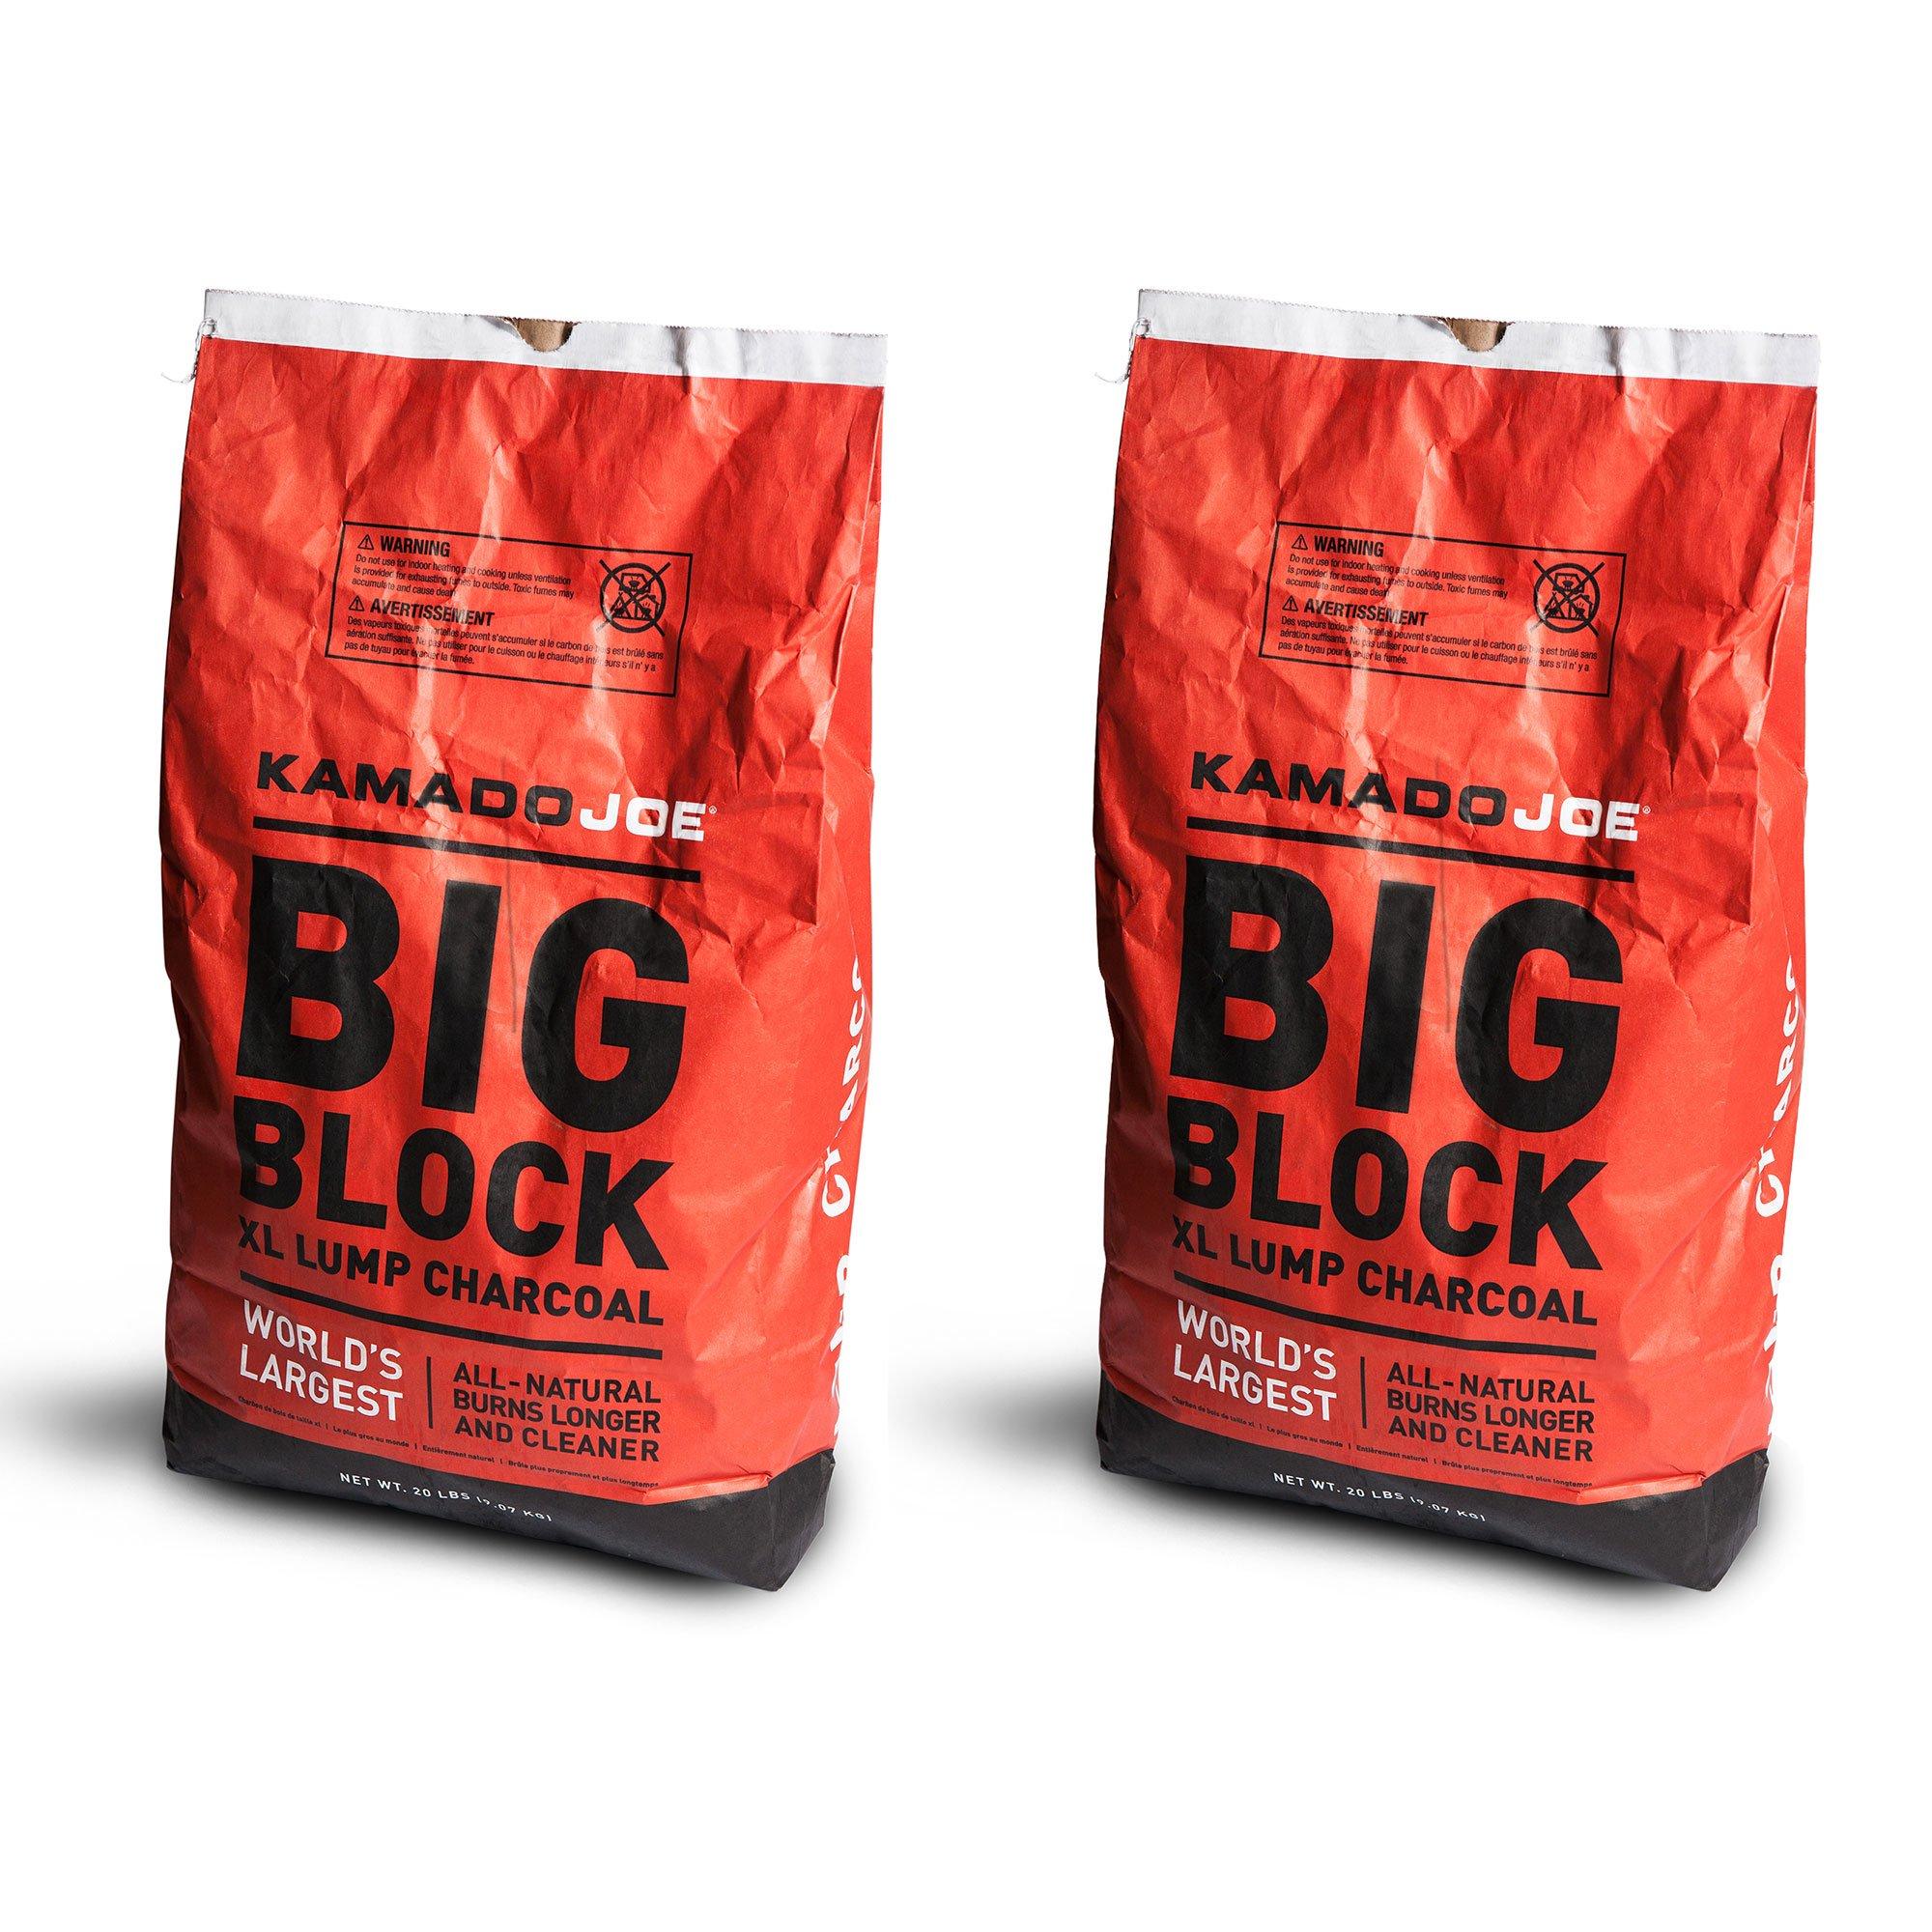 KamadoJoe All-Natural Big Block XL Lump Charcoal, 20 Lb (2 Pack)